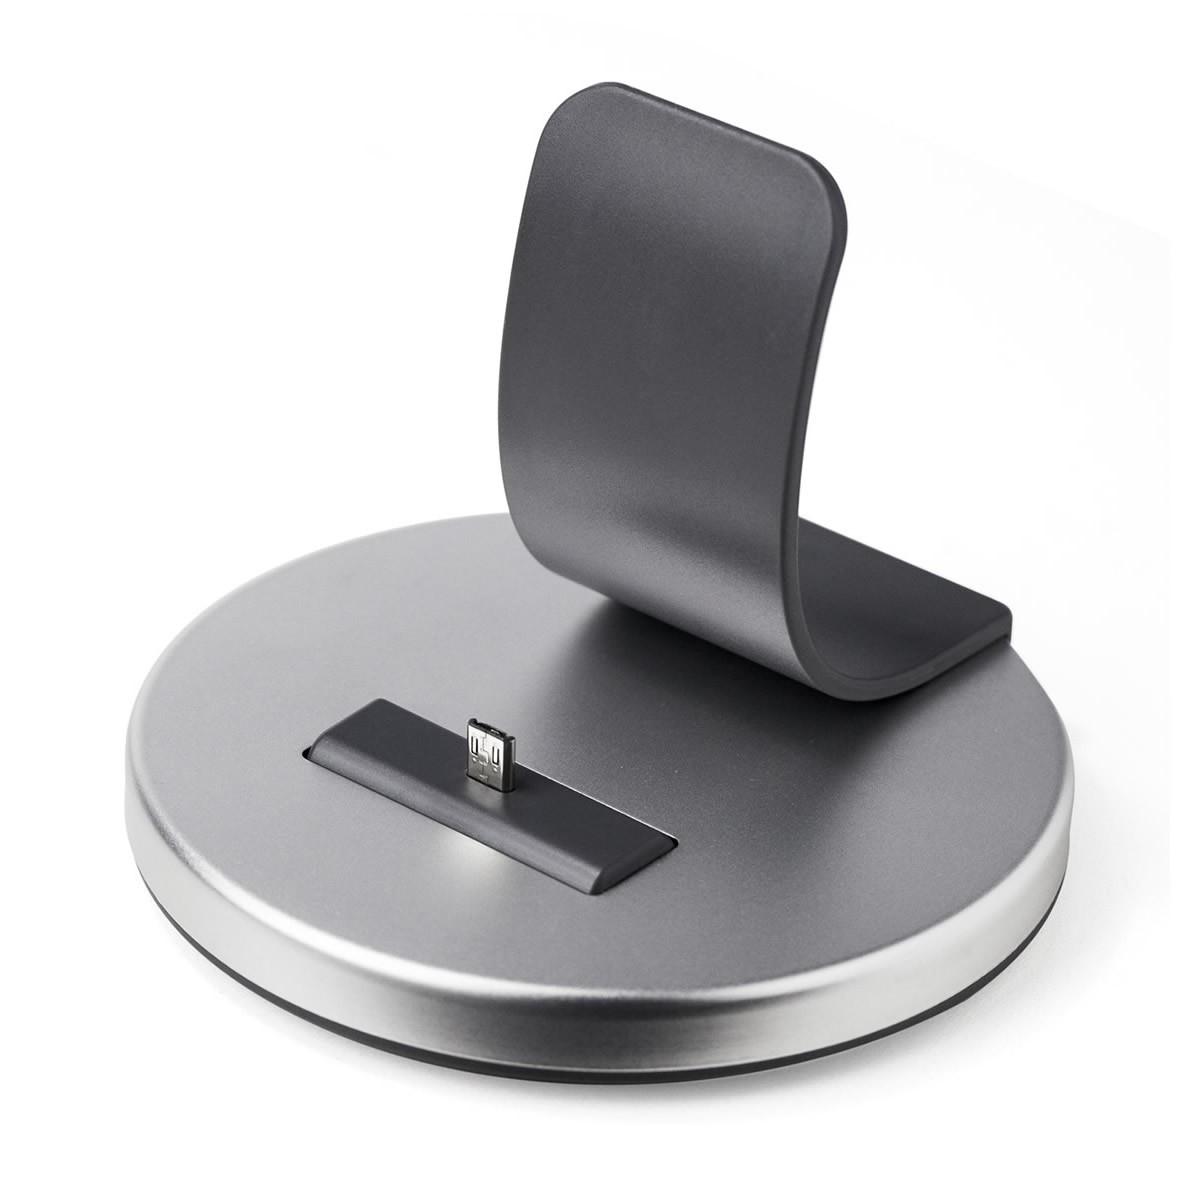 FiiO DK1 Multifunction Dock for Digital Audio Players Fiio